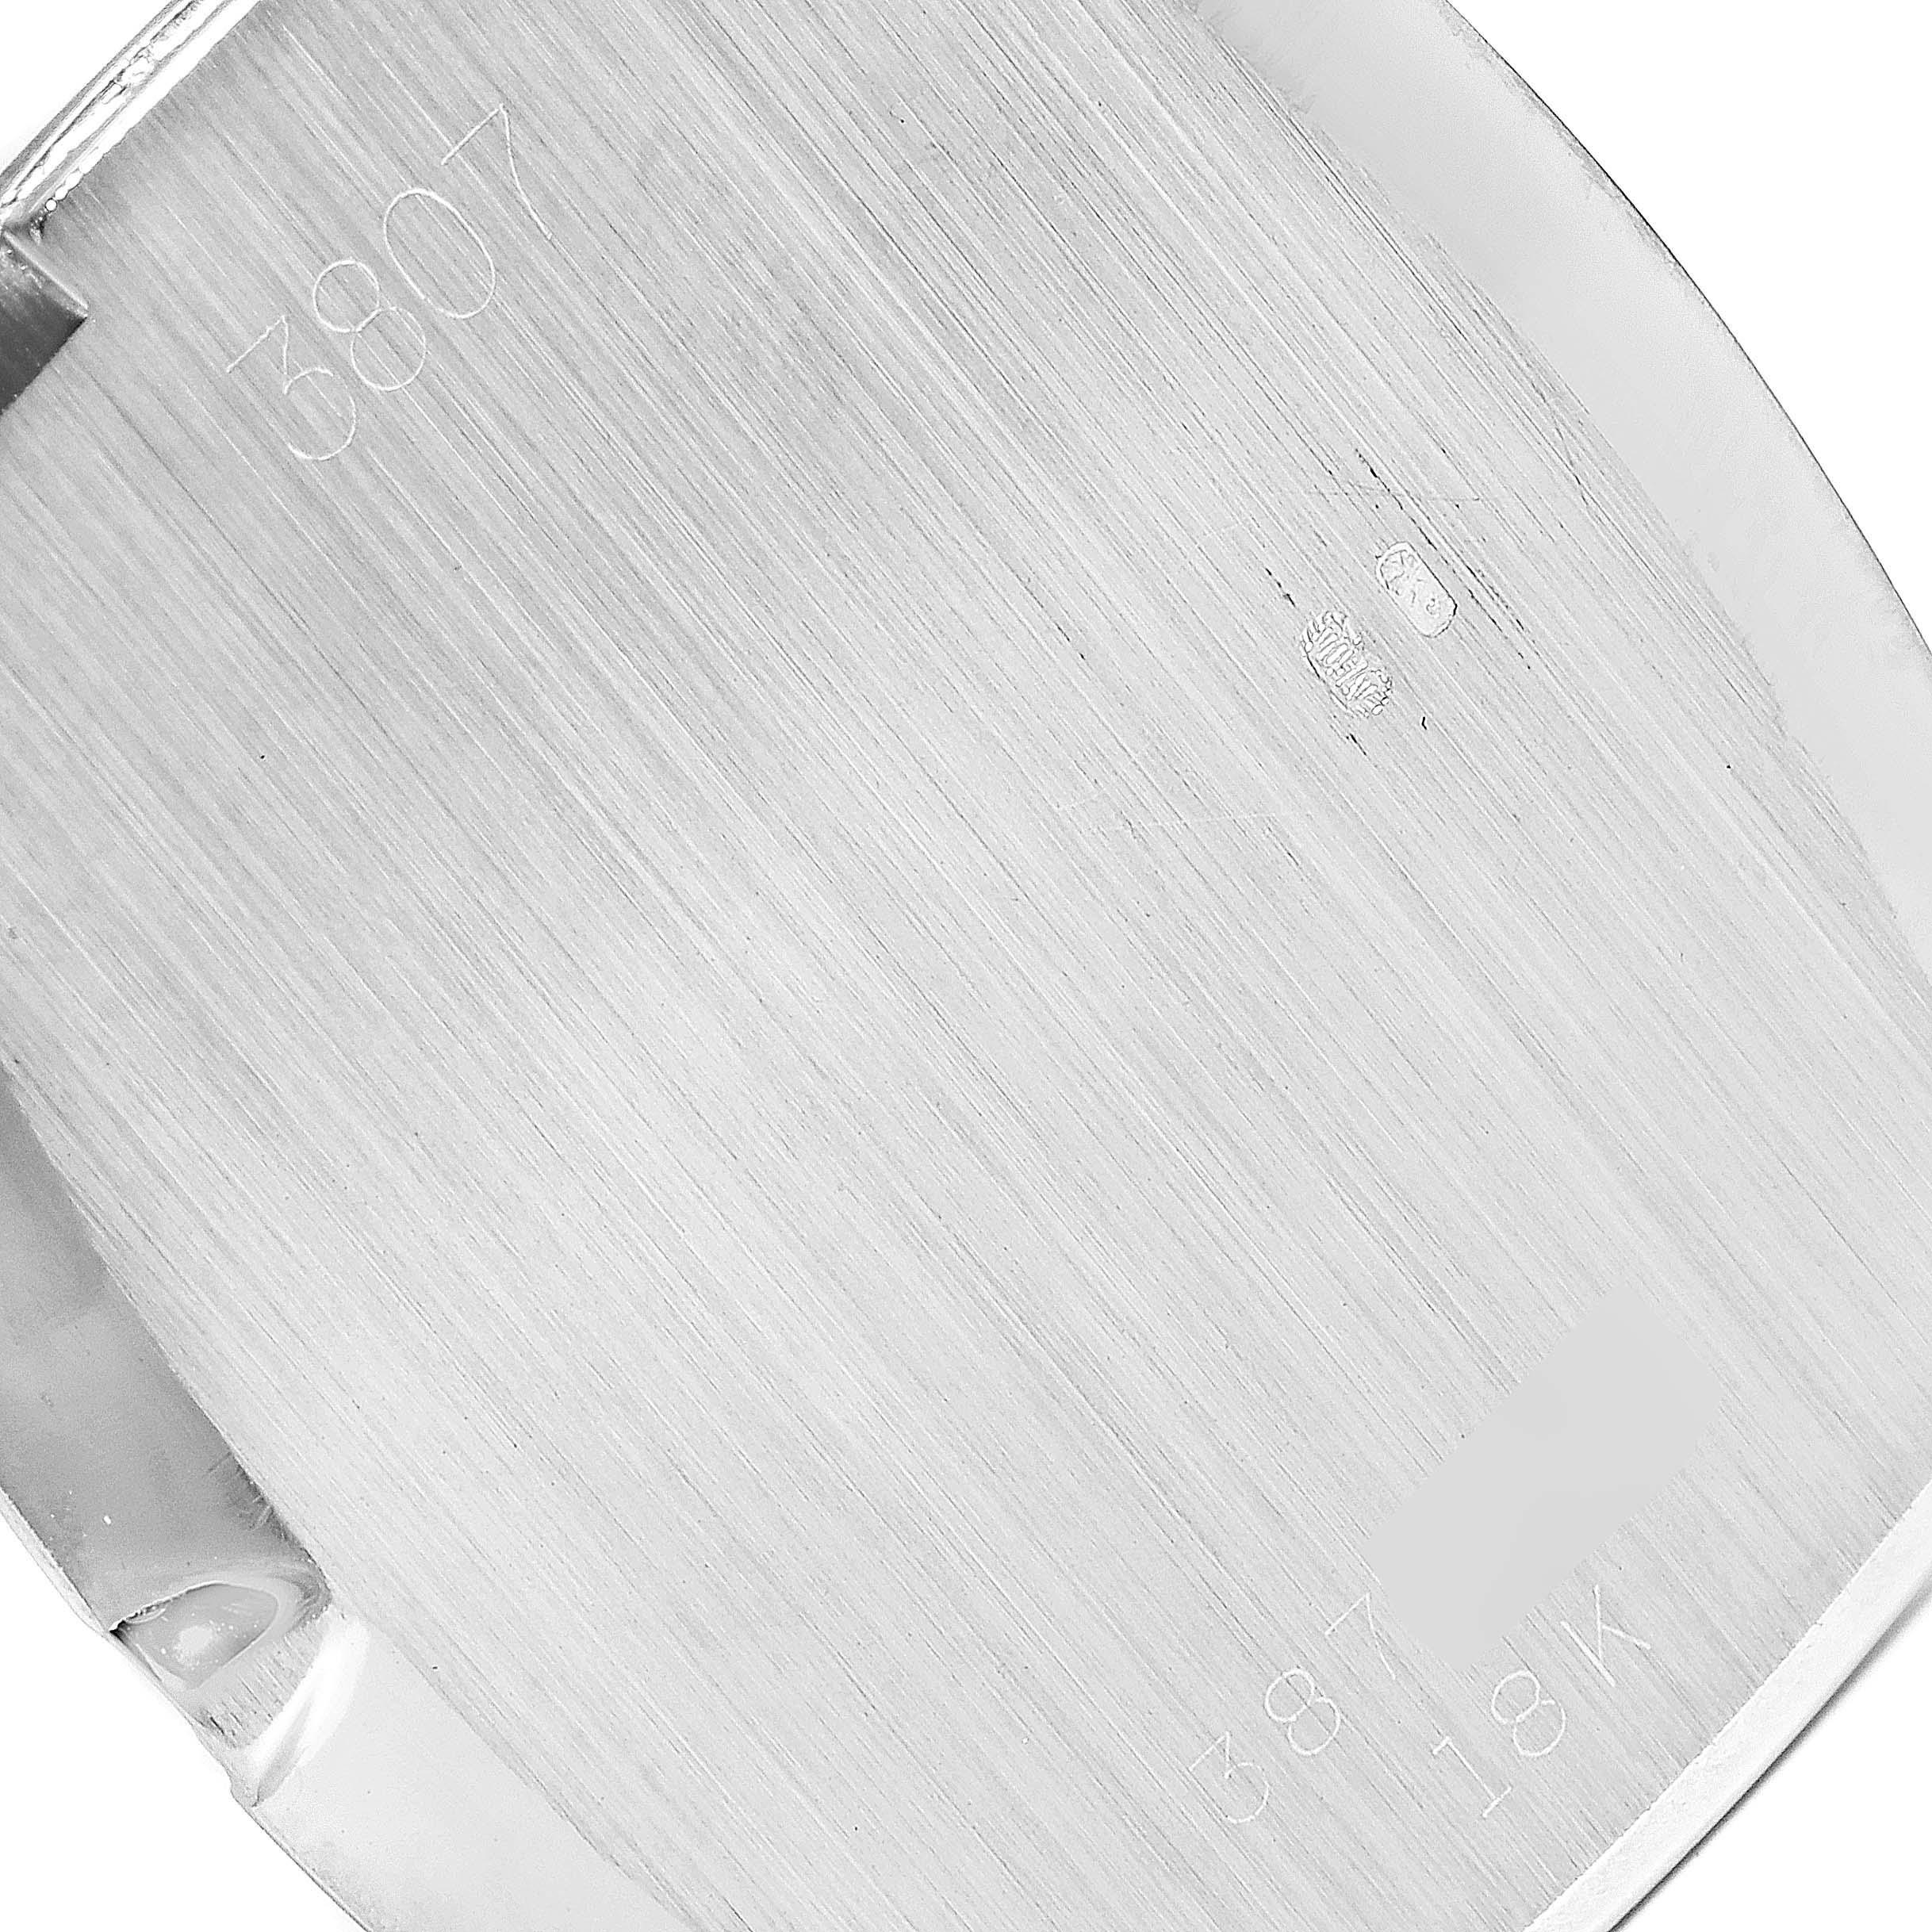 Rolex Cellini White Gold Blue Vignette Dial Vintage Ladies Watch 3807 SwissWatchExpo